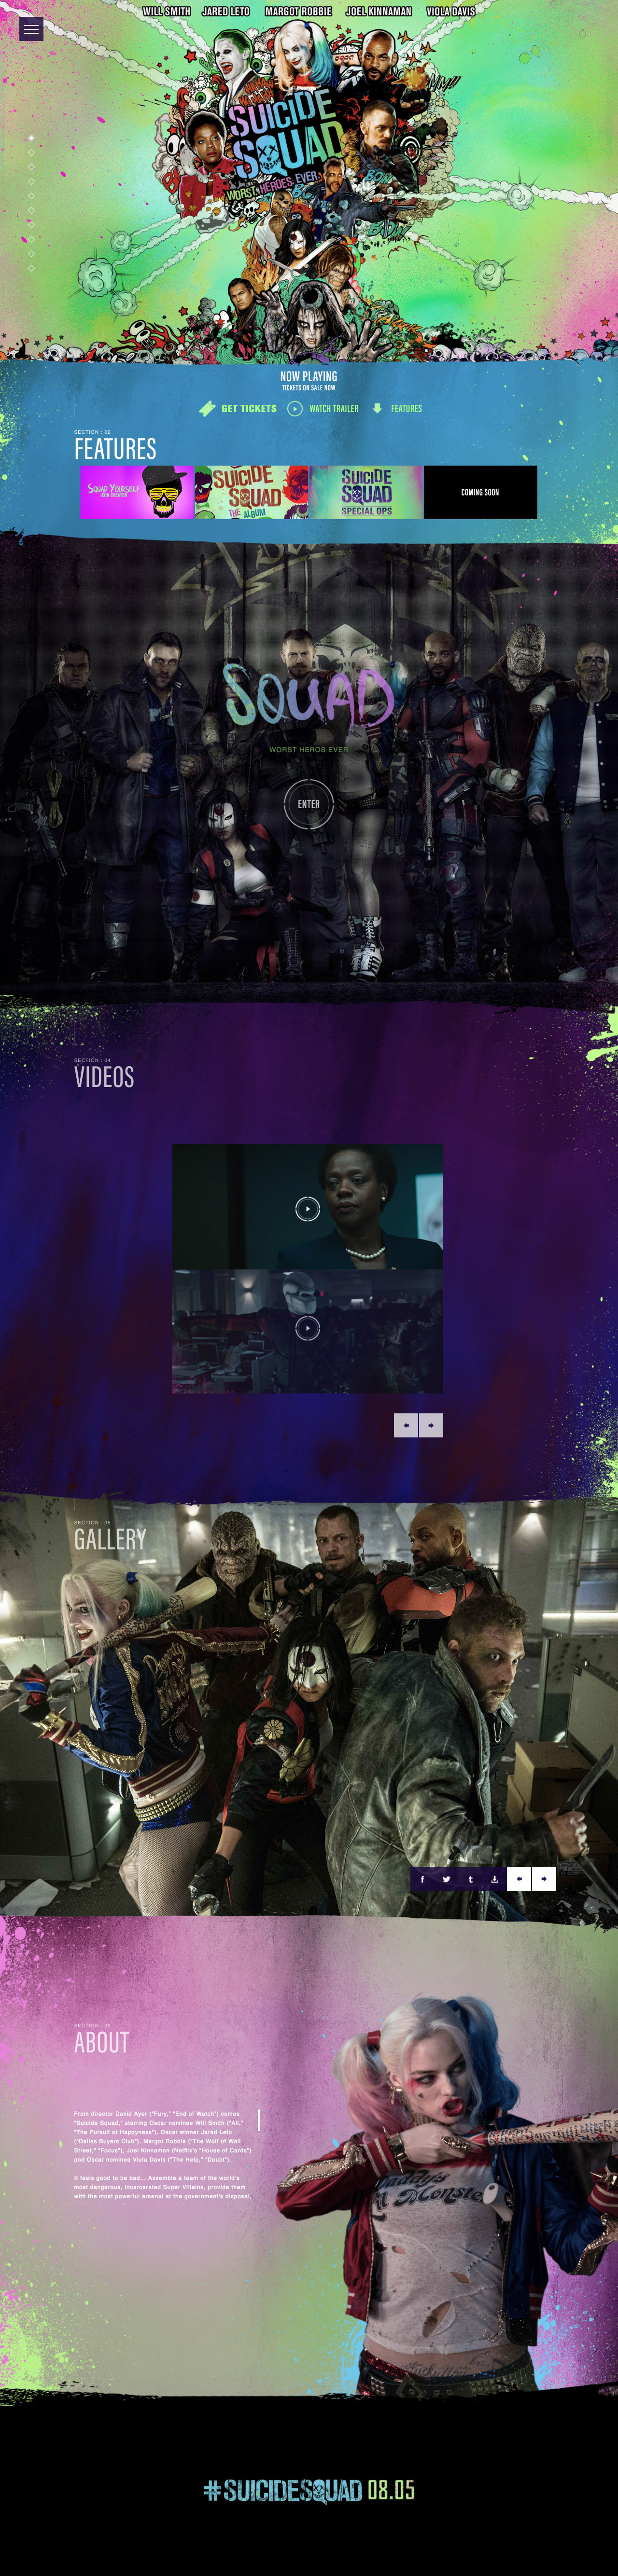 Suicide Squad Website Screenshot